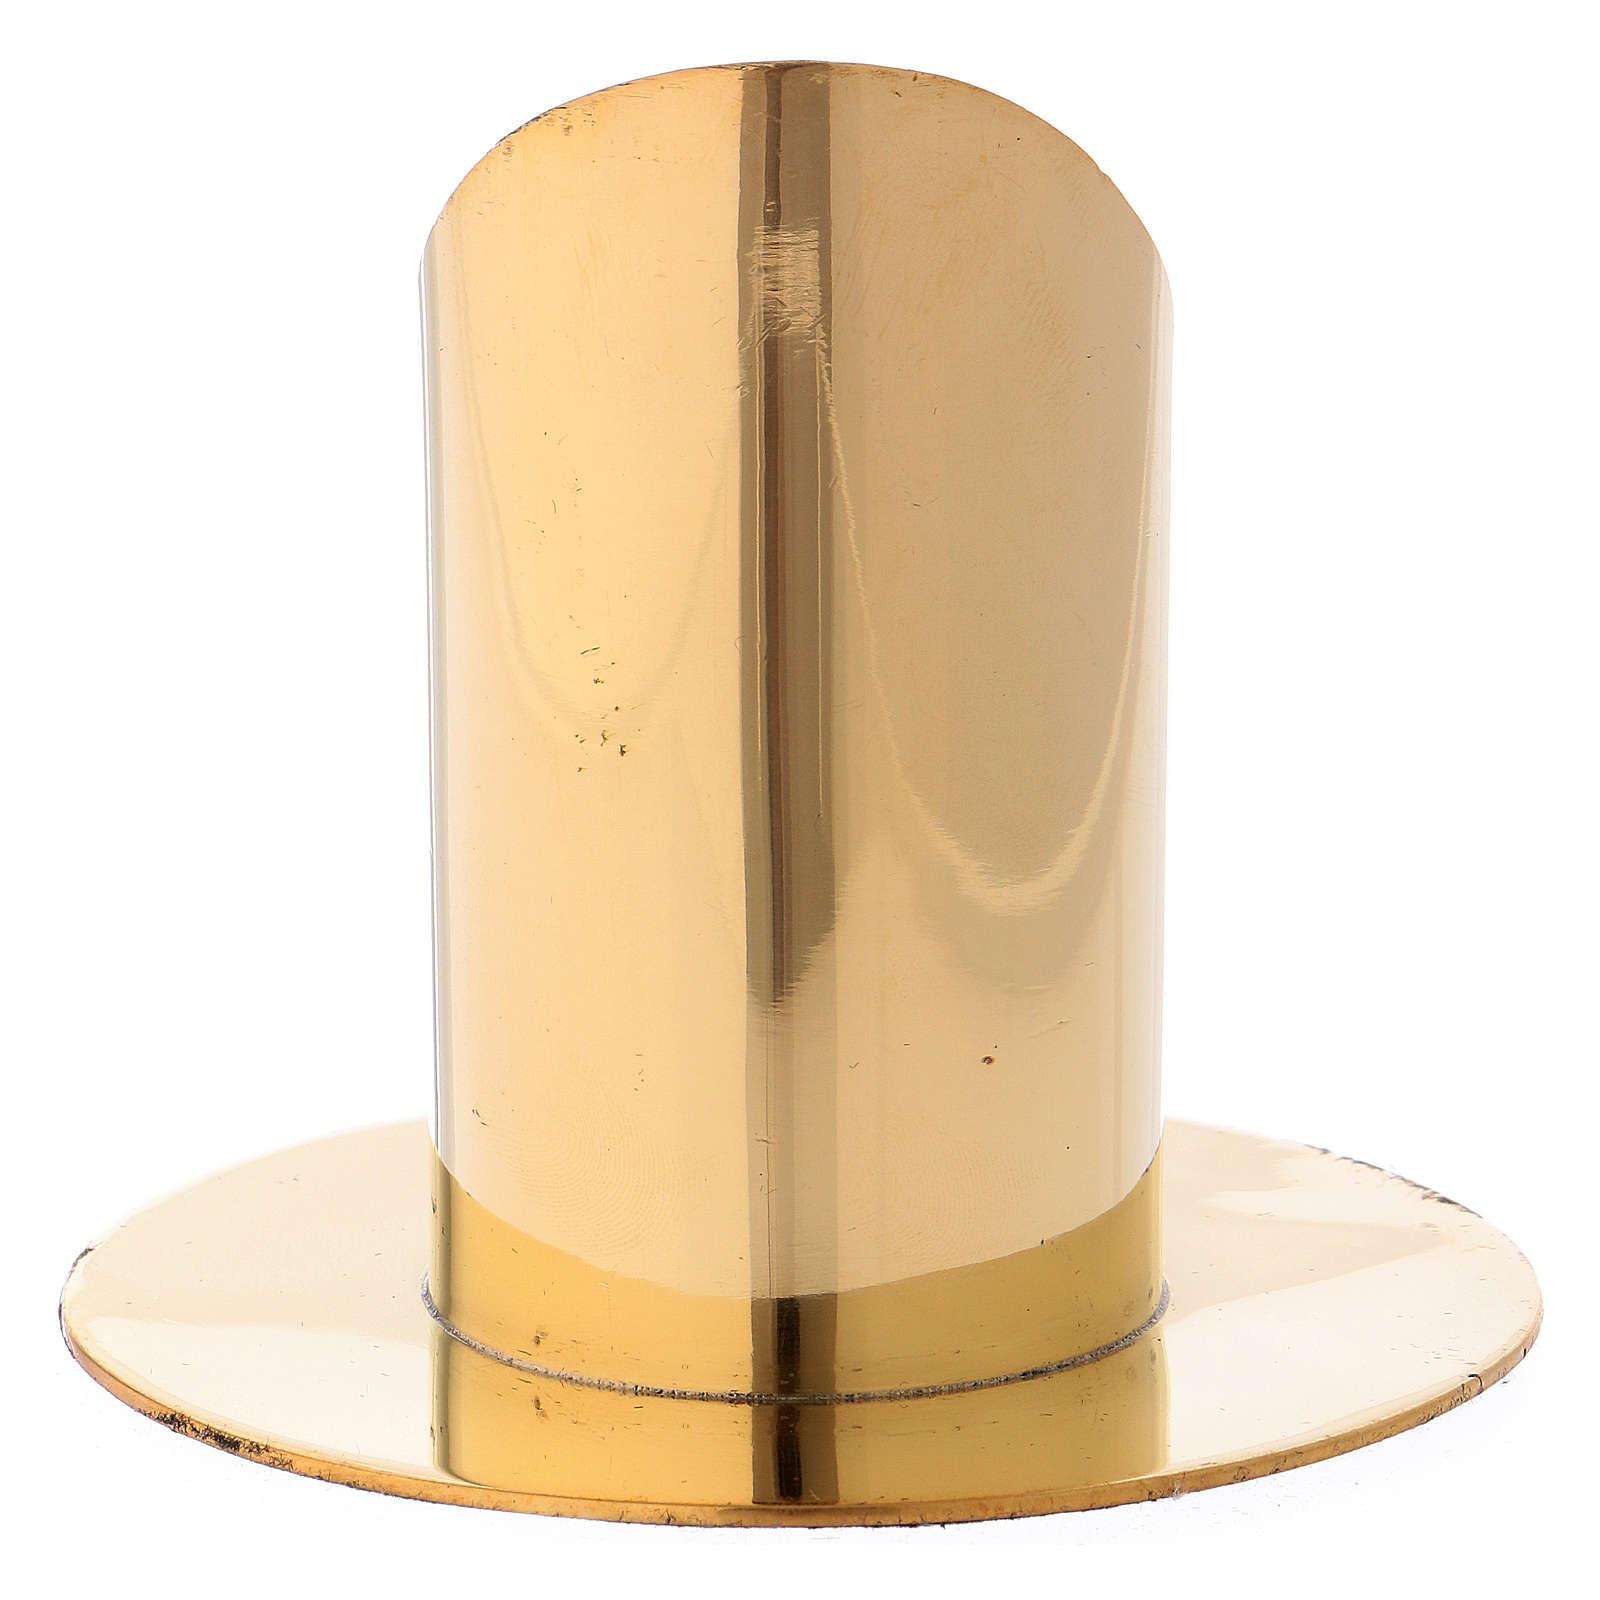 Portacandela ottone dorato h 9 cm 4